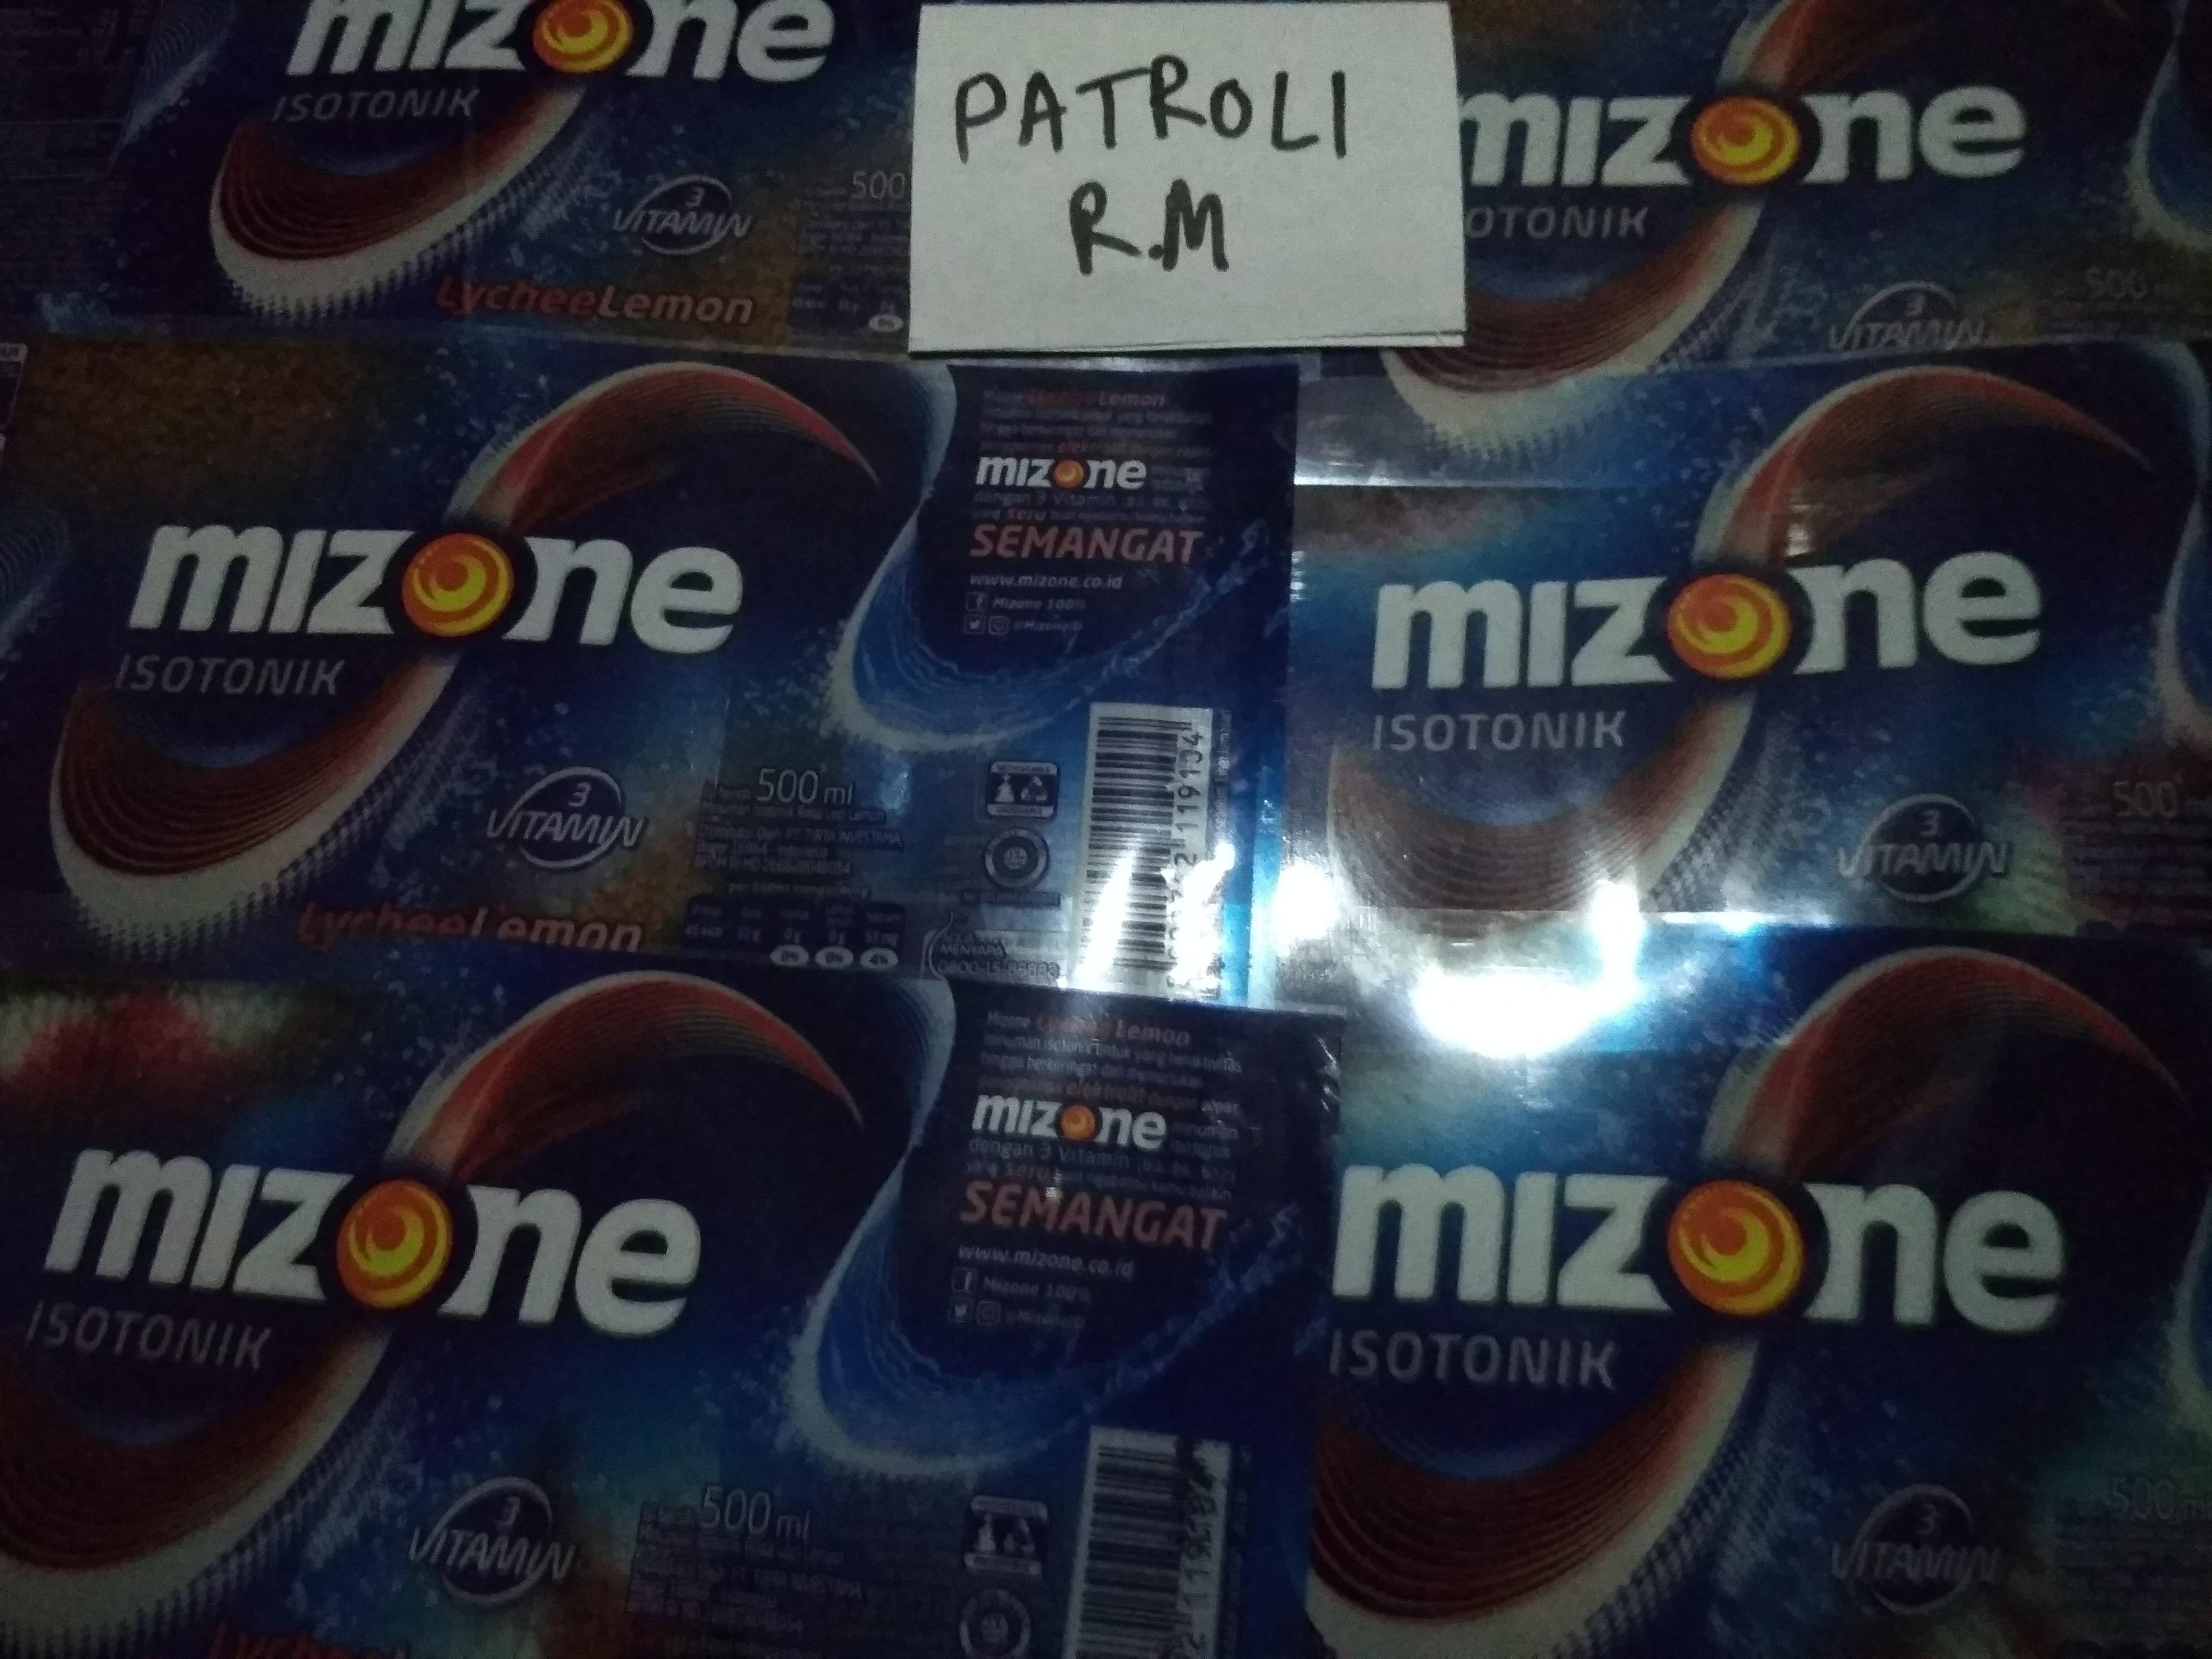 #kaskusxmizone patroli